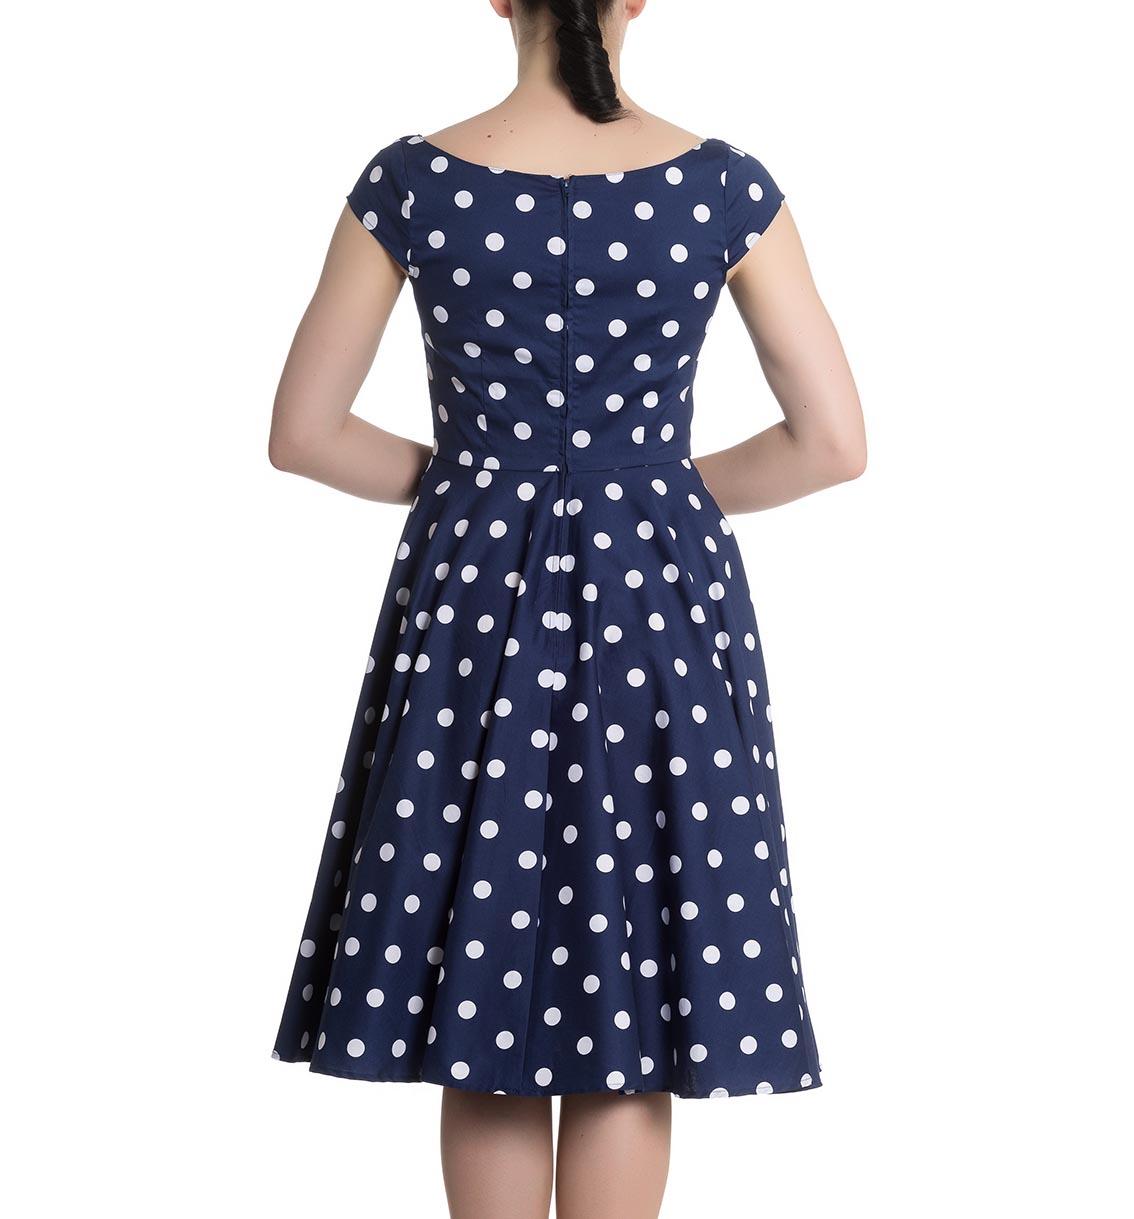 Hell-Bunny-50s-Dress-Polka-Dot-NICKY-Pin-Up-Rockabilly-Navy-Blue-All-Sizes thumbnail 7